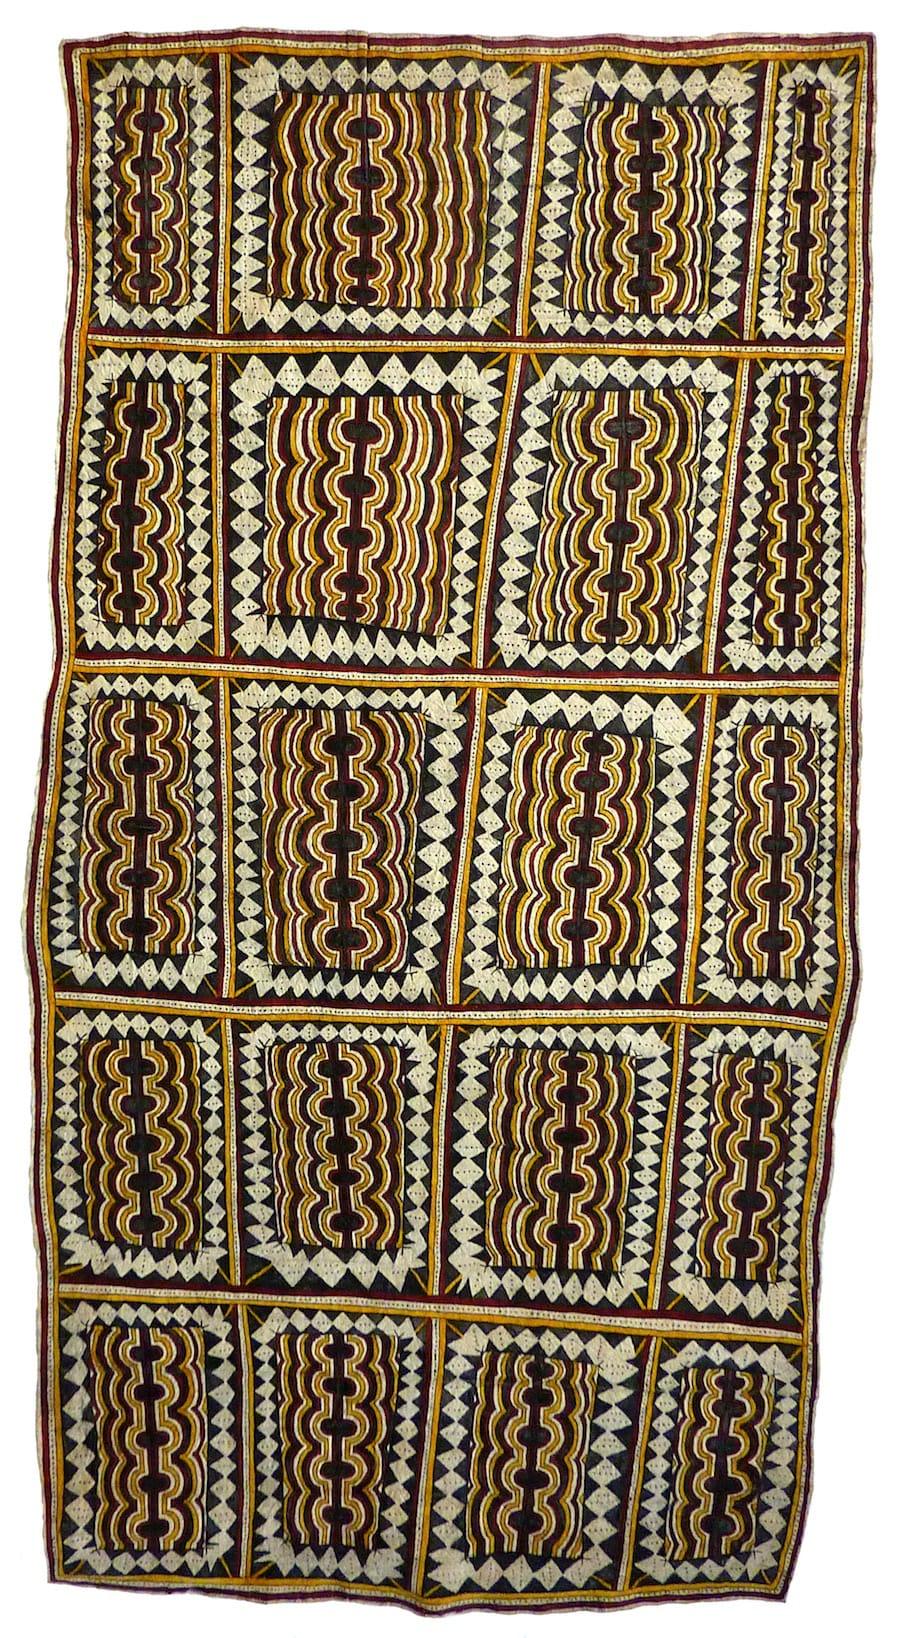 Lila Warrimou (Misaso) Hartu'e, mahuva'oje'o sabu deje natural pigments on nioge (barkcloth) 155 x 80 cm